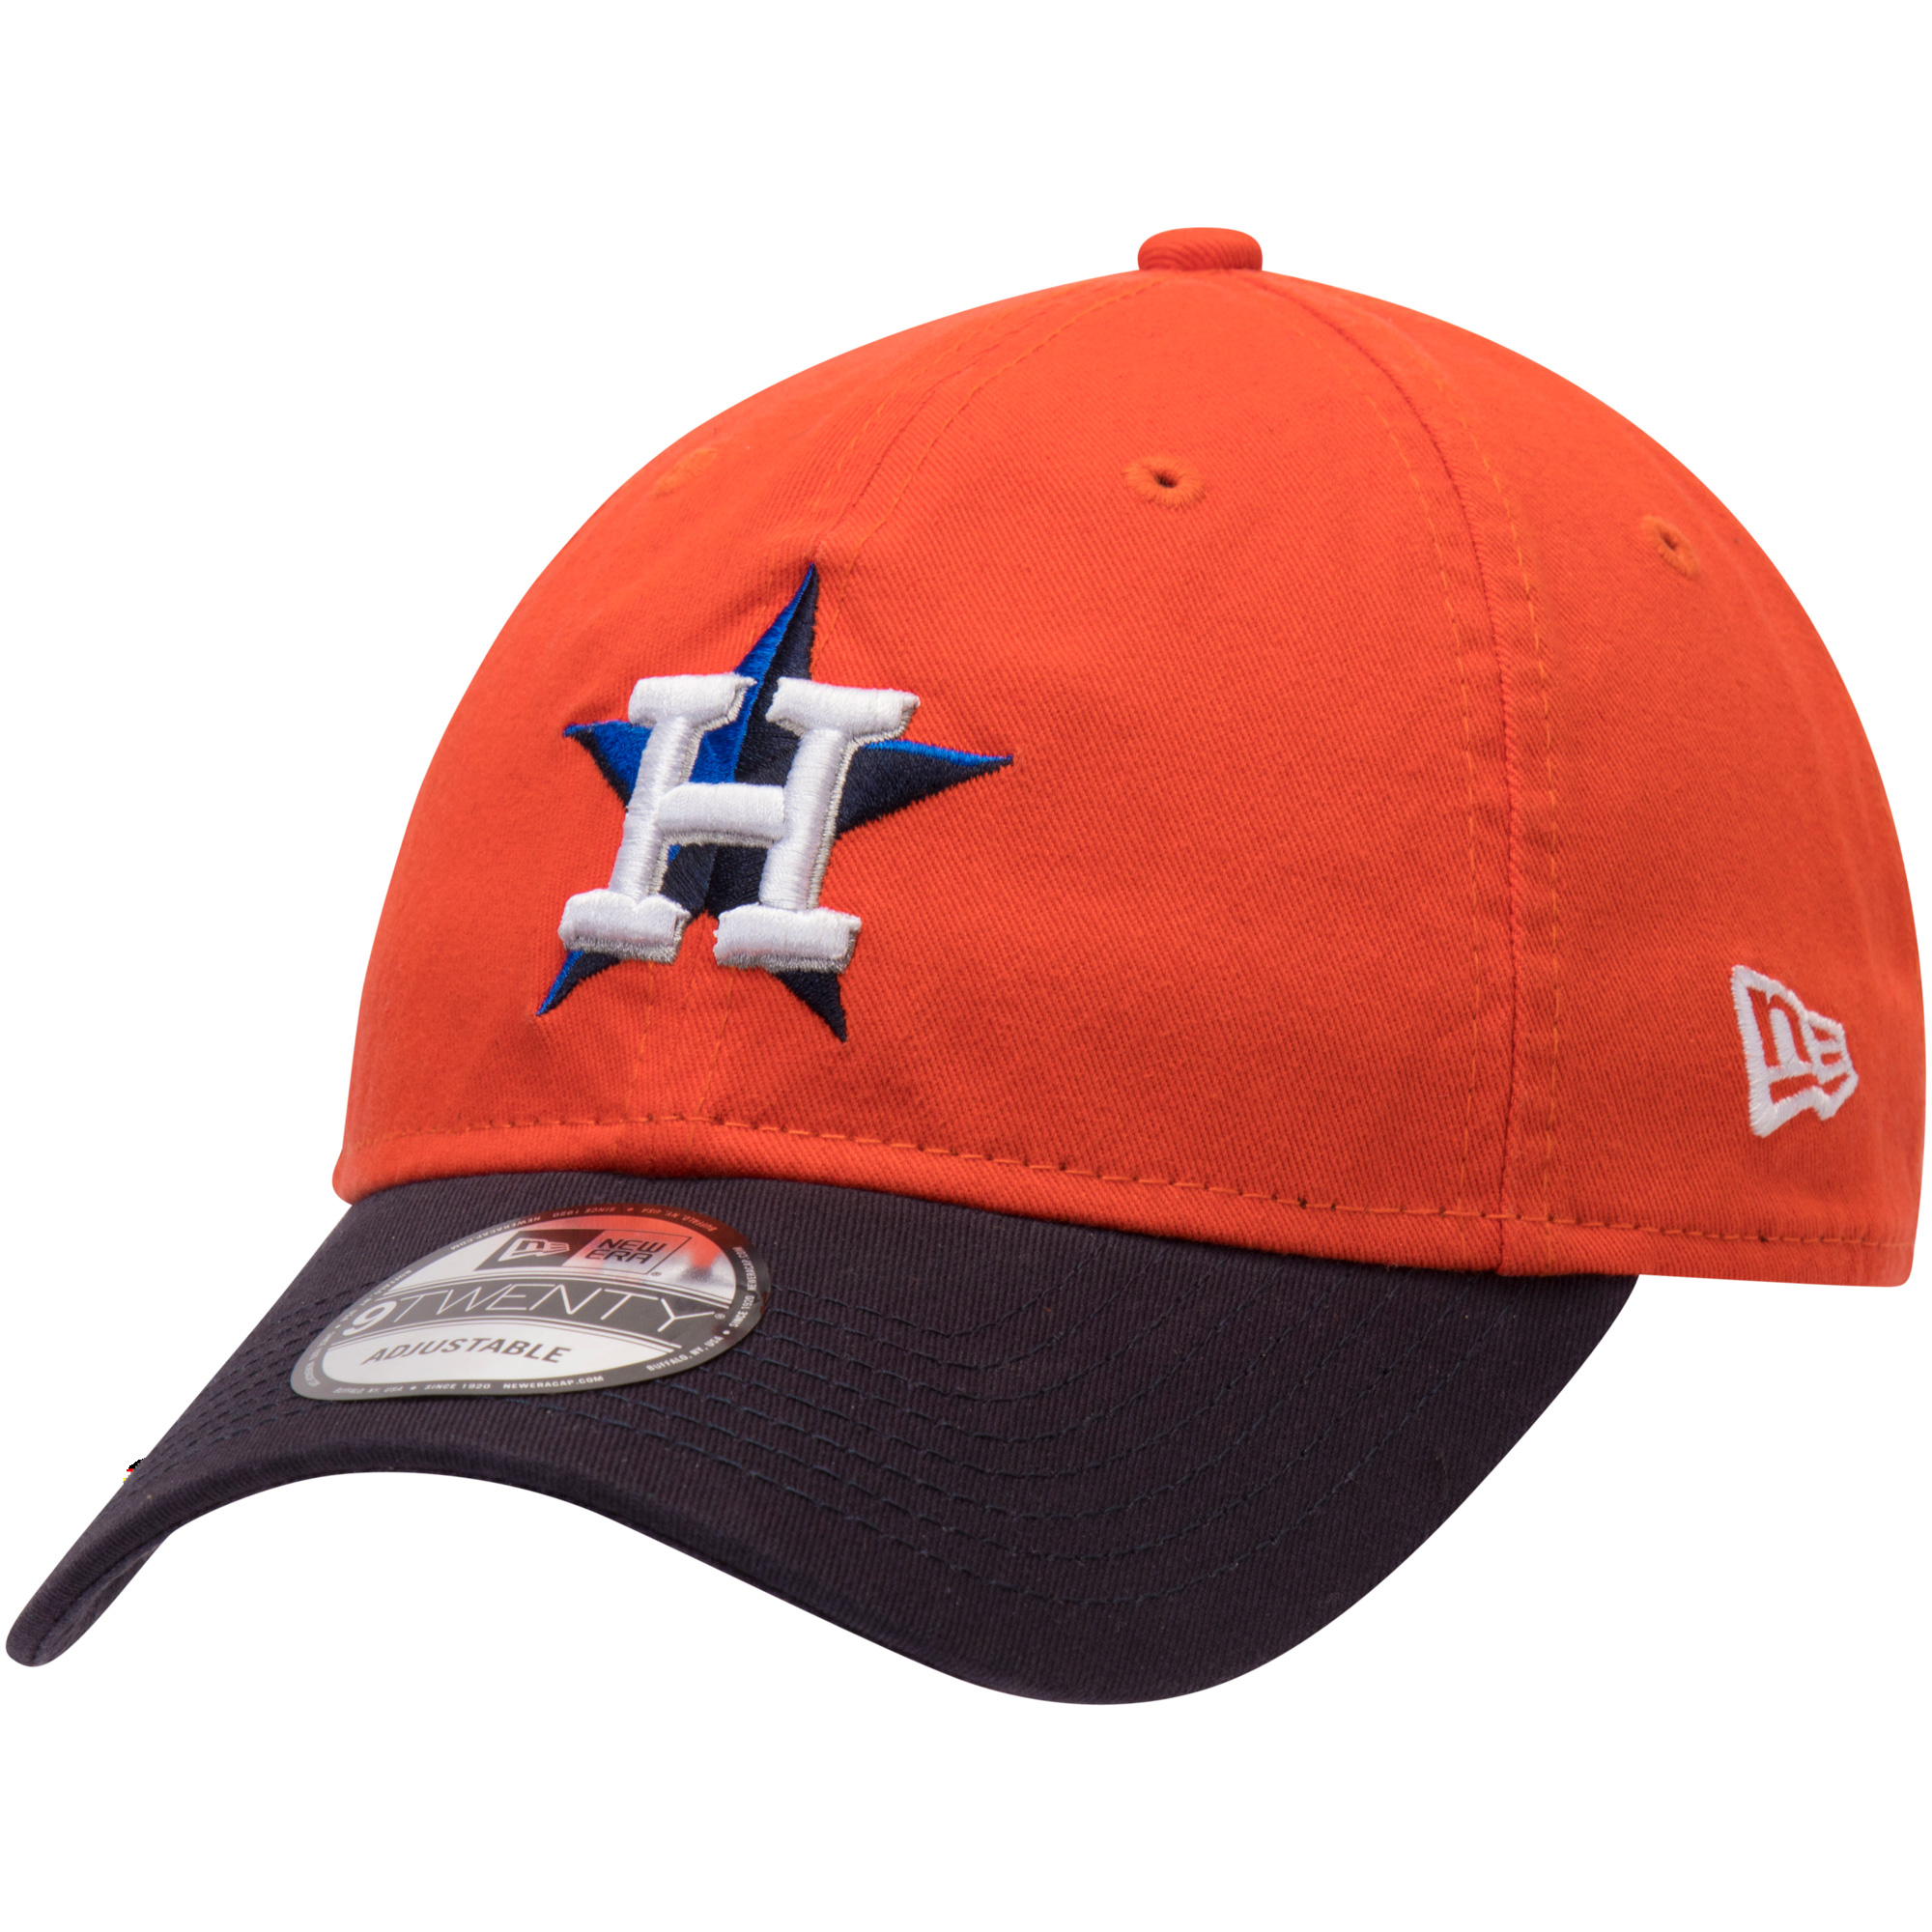 Houston Astros New Era Alternate Replica Core Classic 9TWENTY Adjustable Hat - Orange/Navy - OSFA